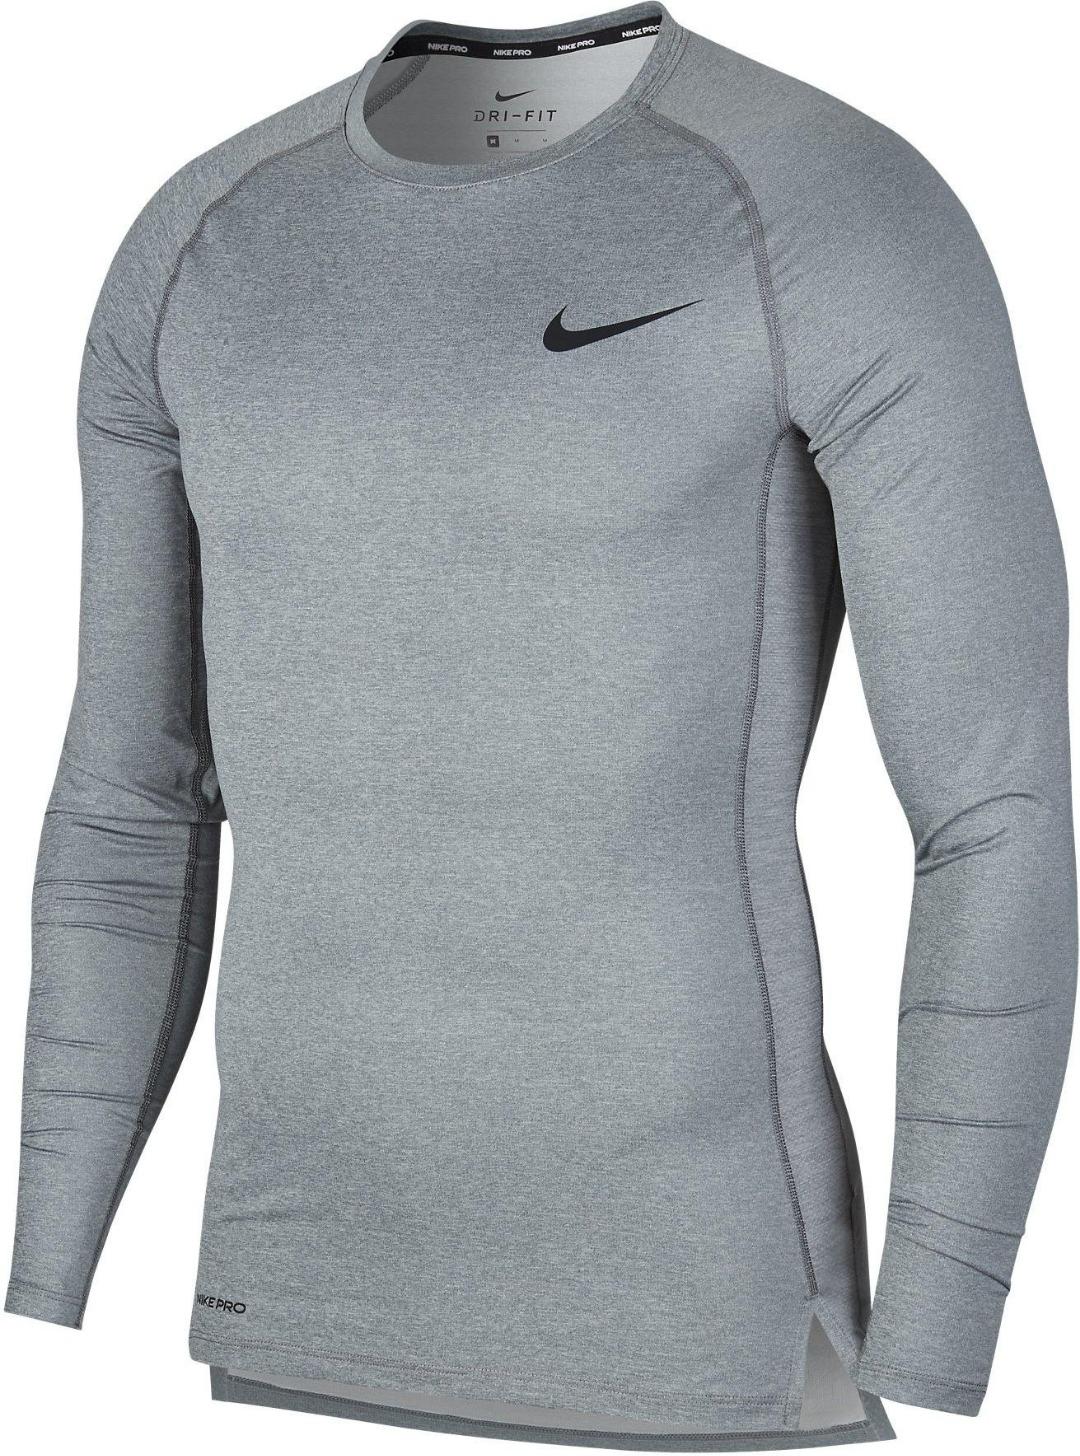 Nike Pro Long-Sleeve Top Grigio Uomo 1